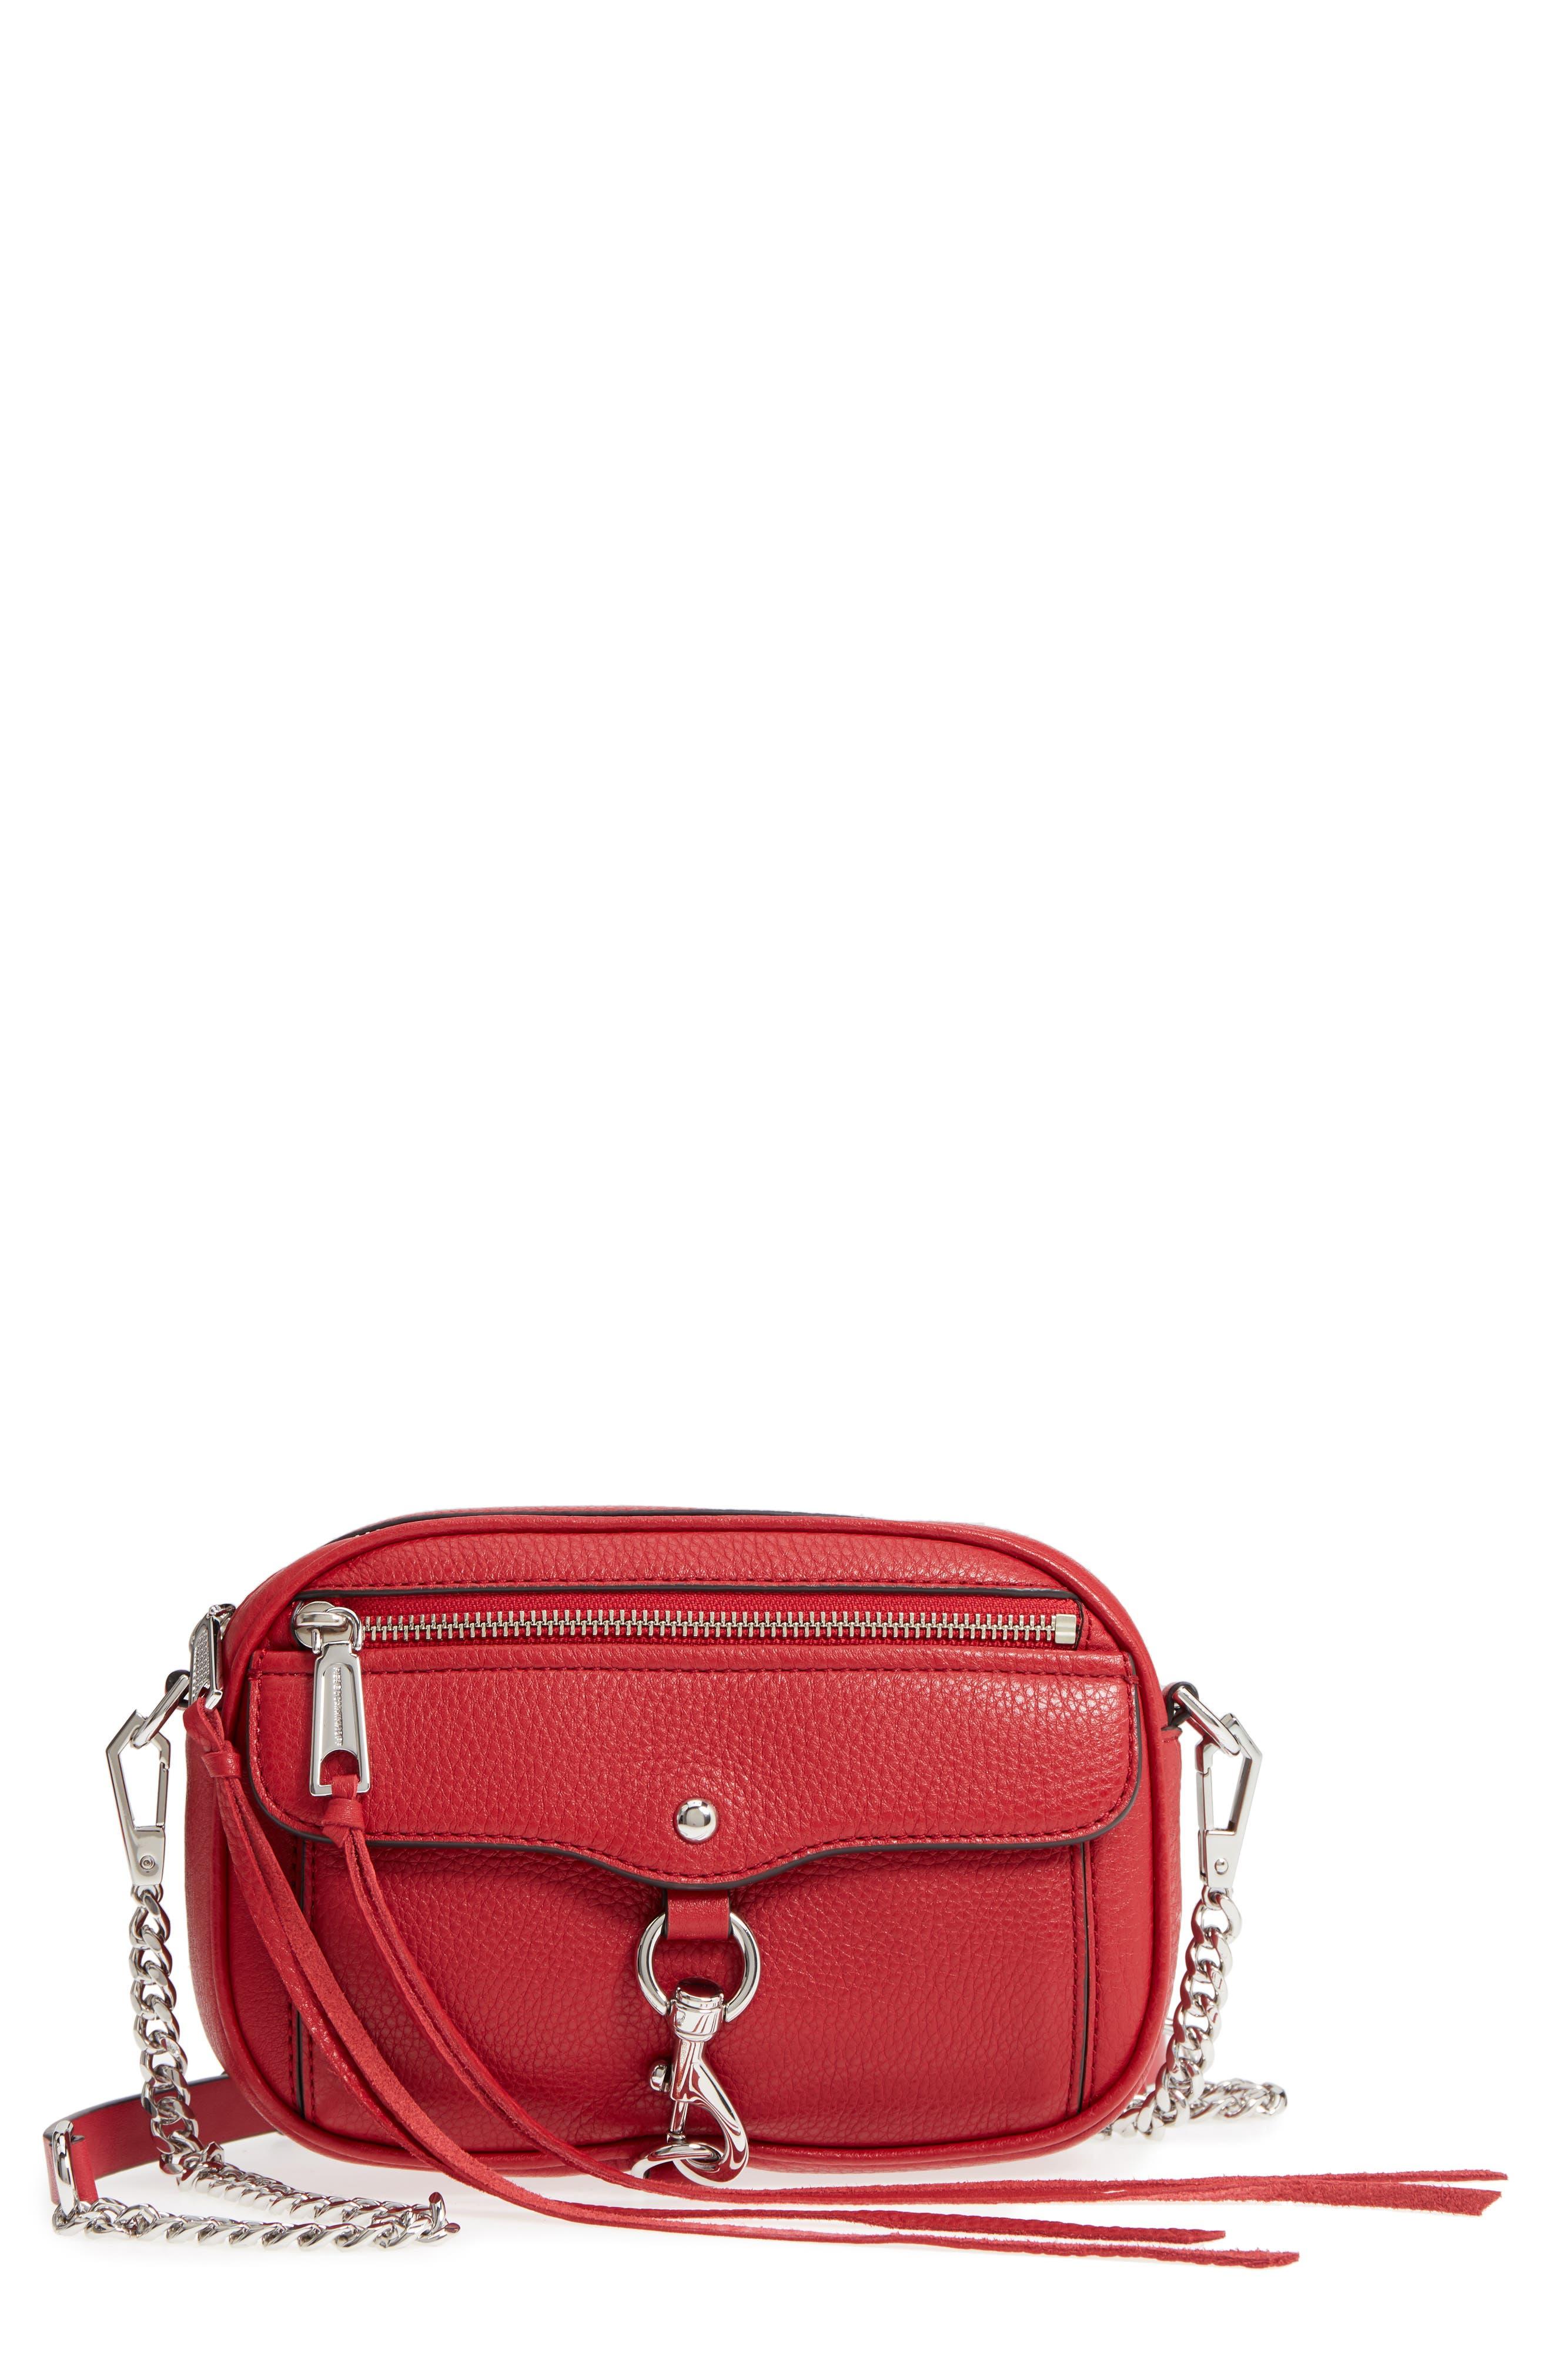 Blythe Leather Crossbody Bag,                             Main thumbnail 1, color,                             Scarlet